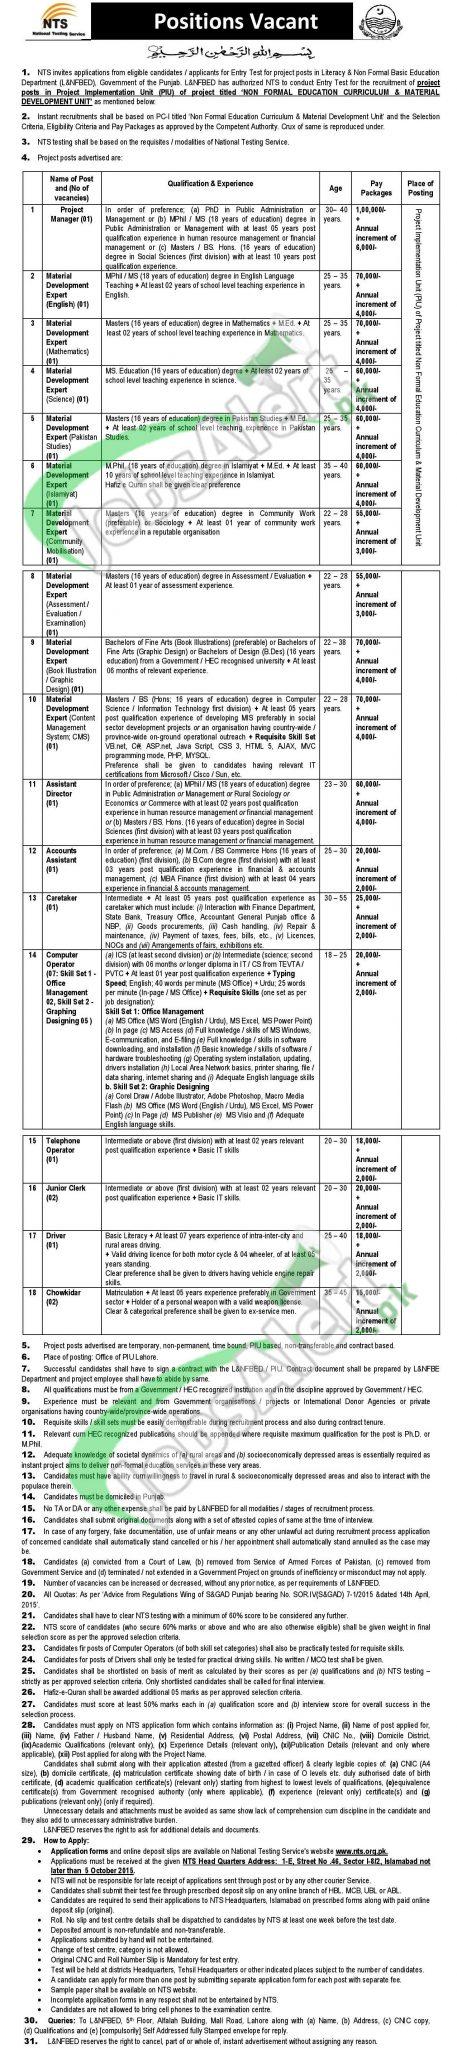 Literacy & NFBE Department Jobs